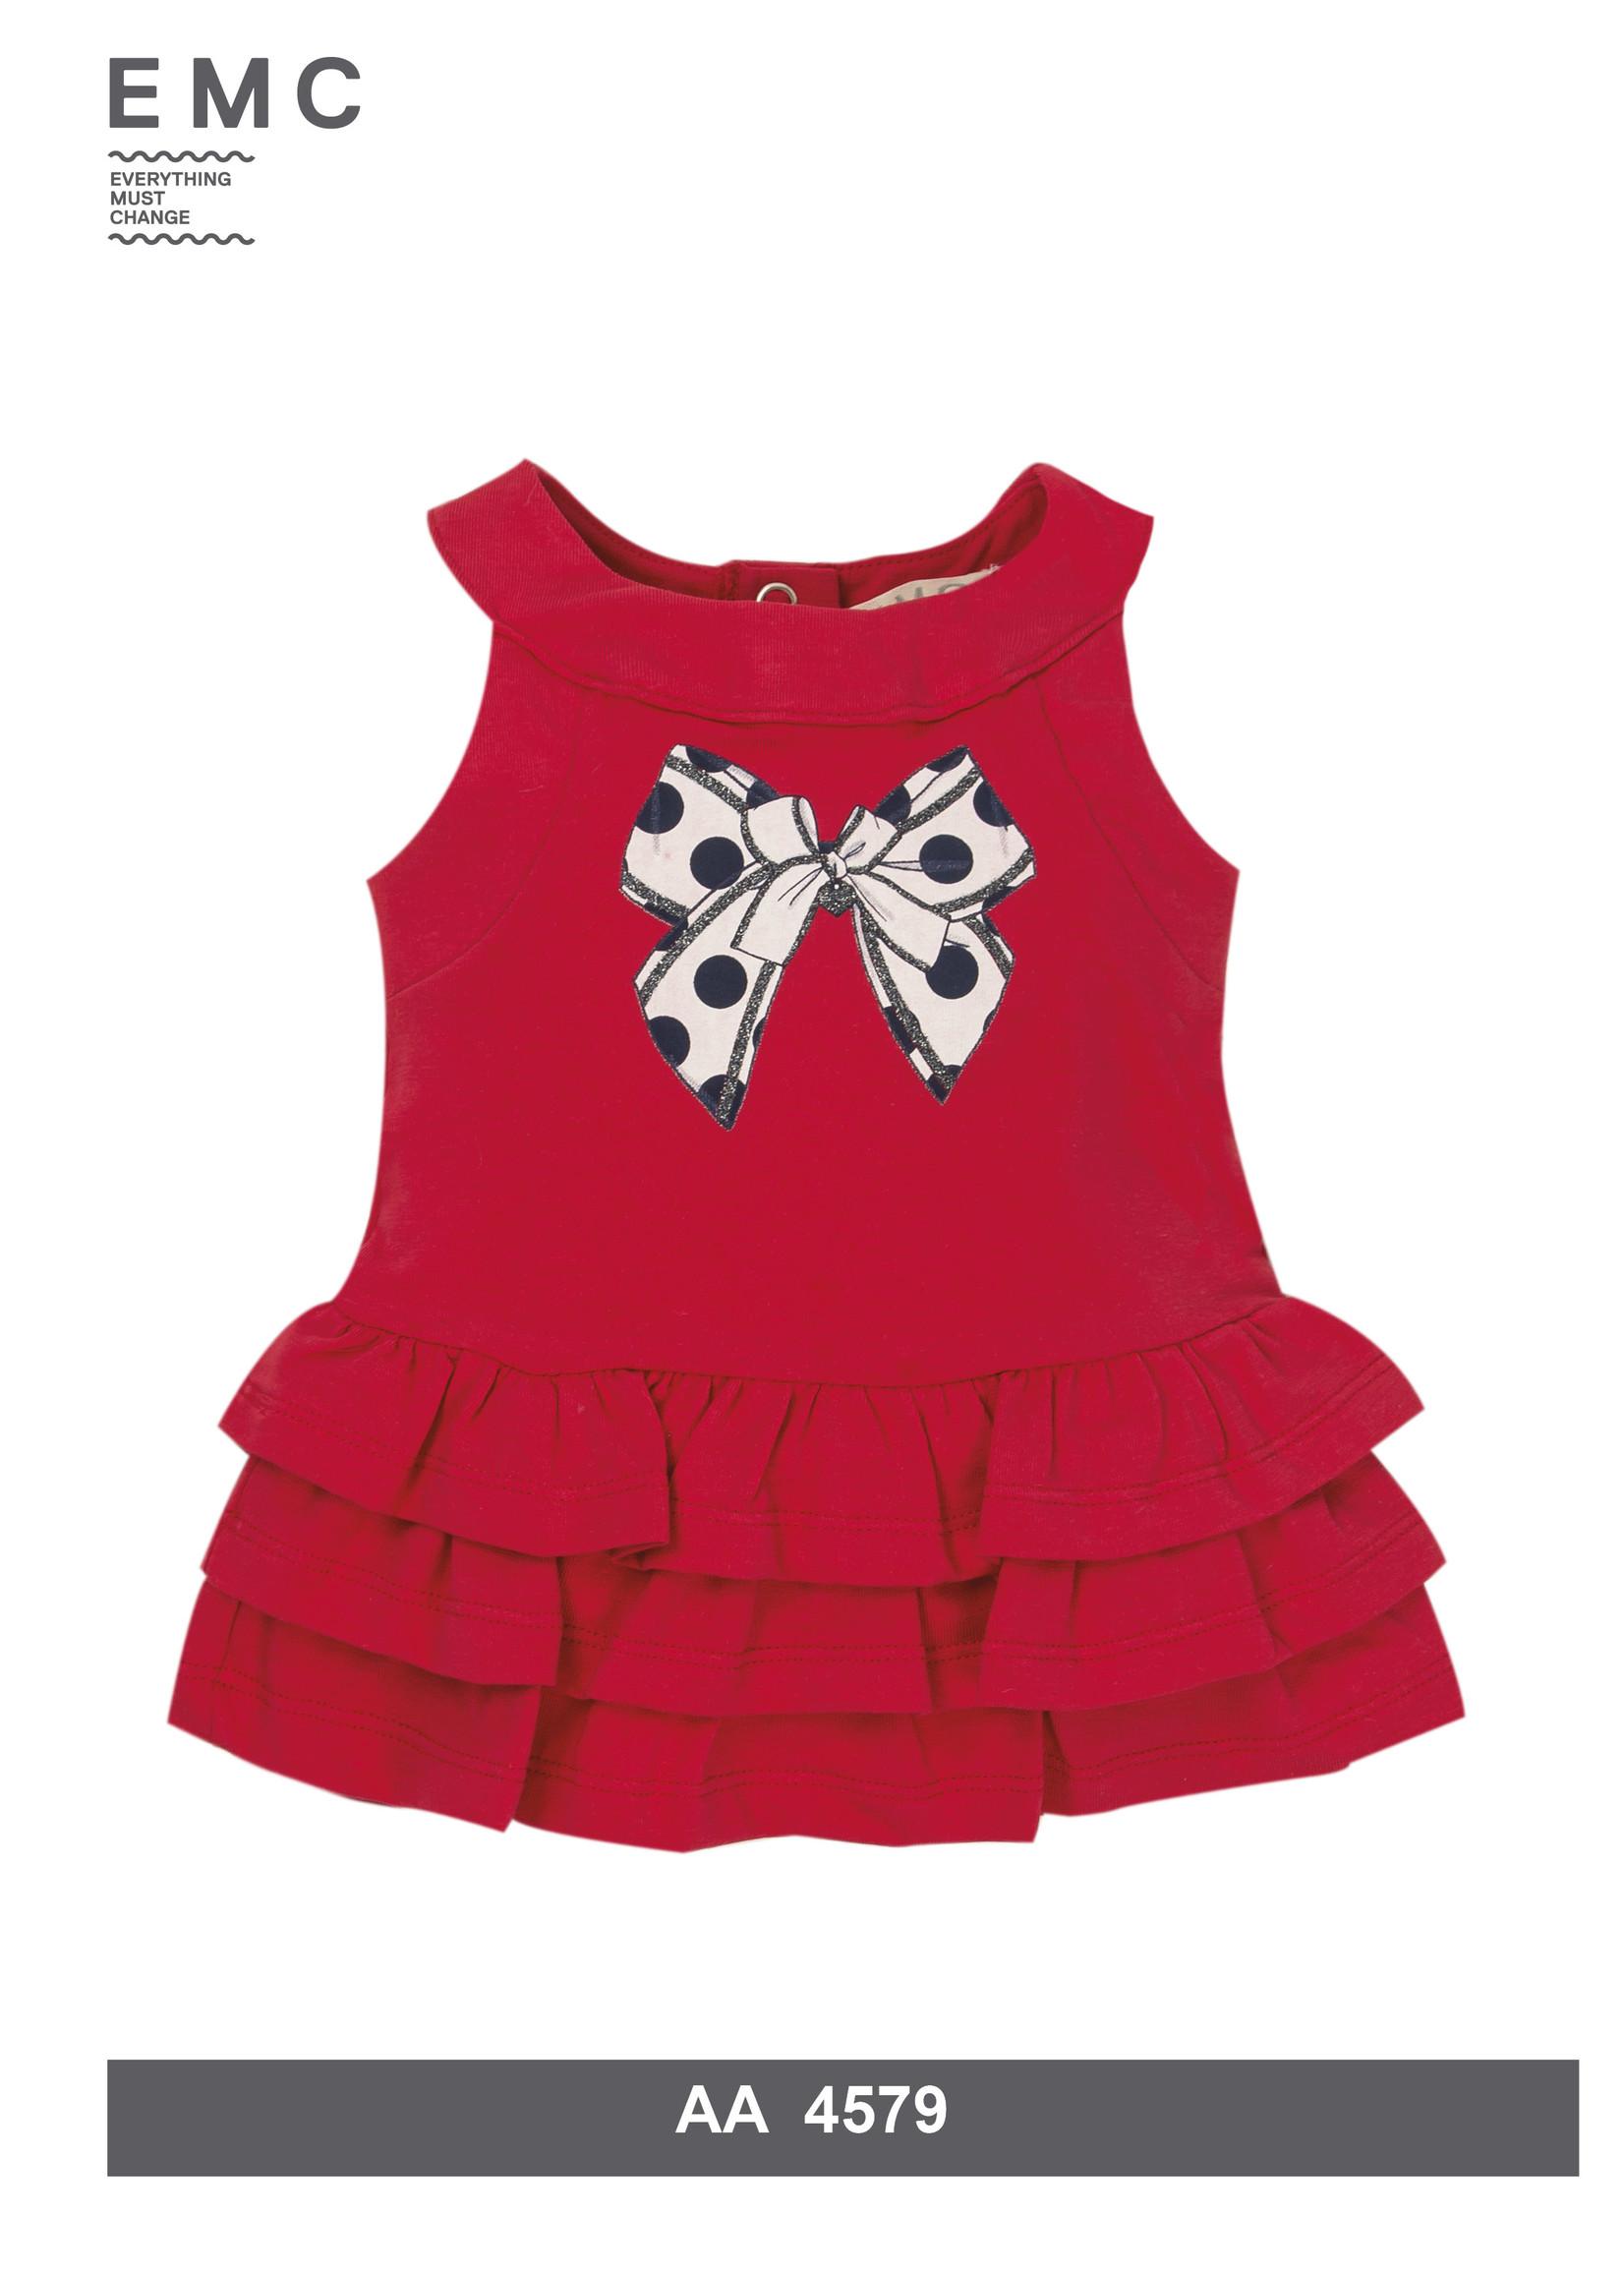 EMC EMC Red bow dress